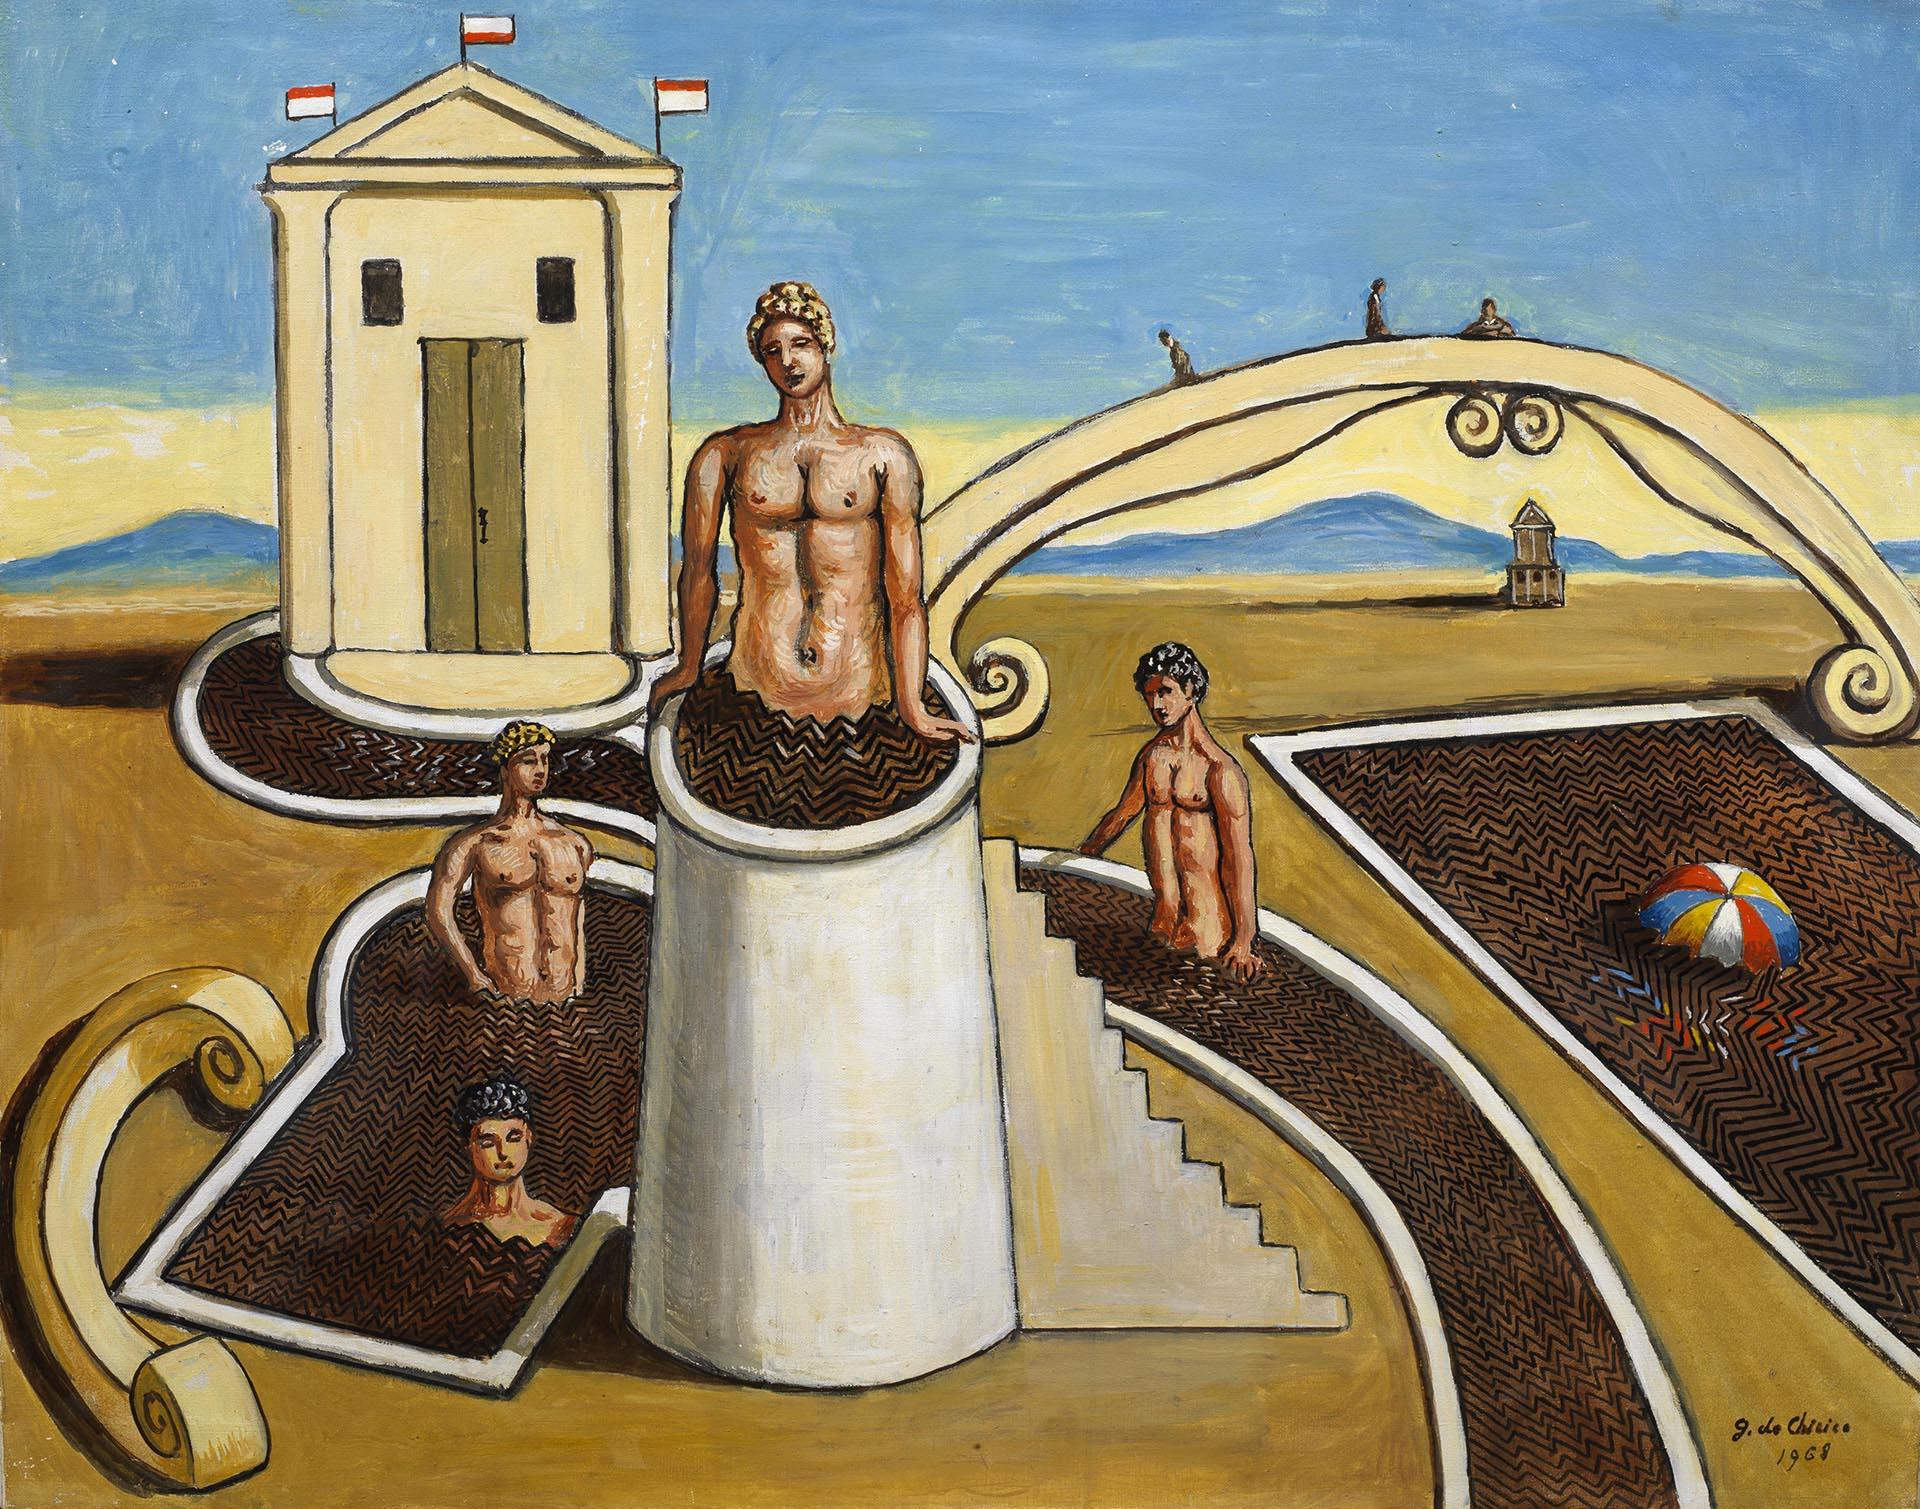 de Chirico, Bagni misteriosi, 1968, 73x93 cm